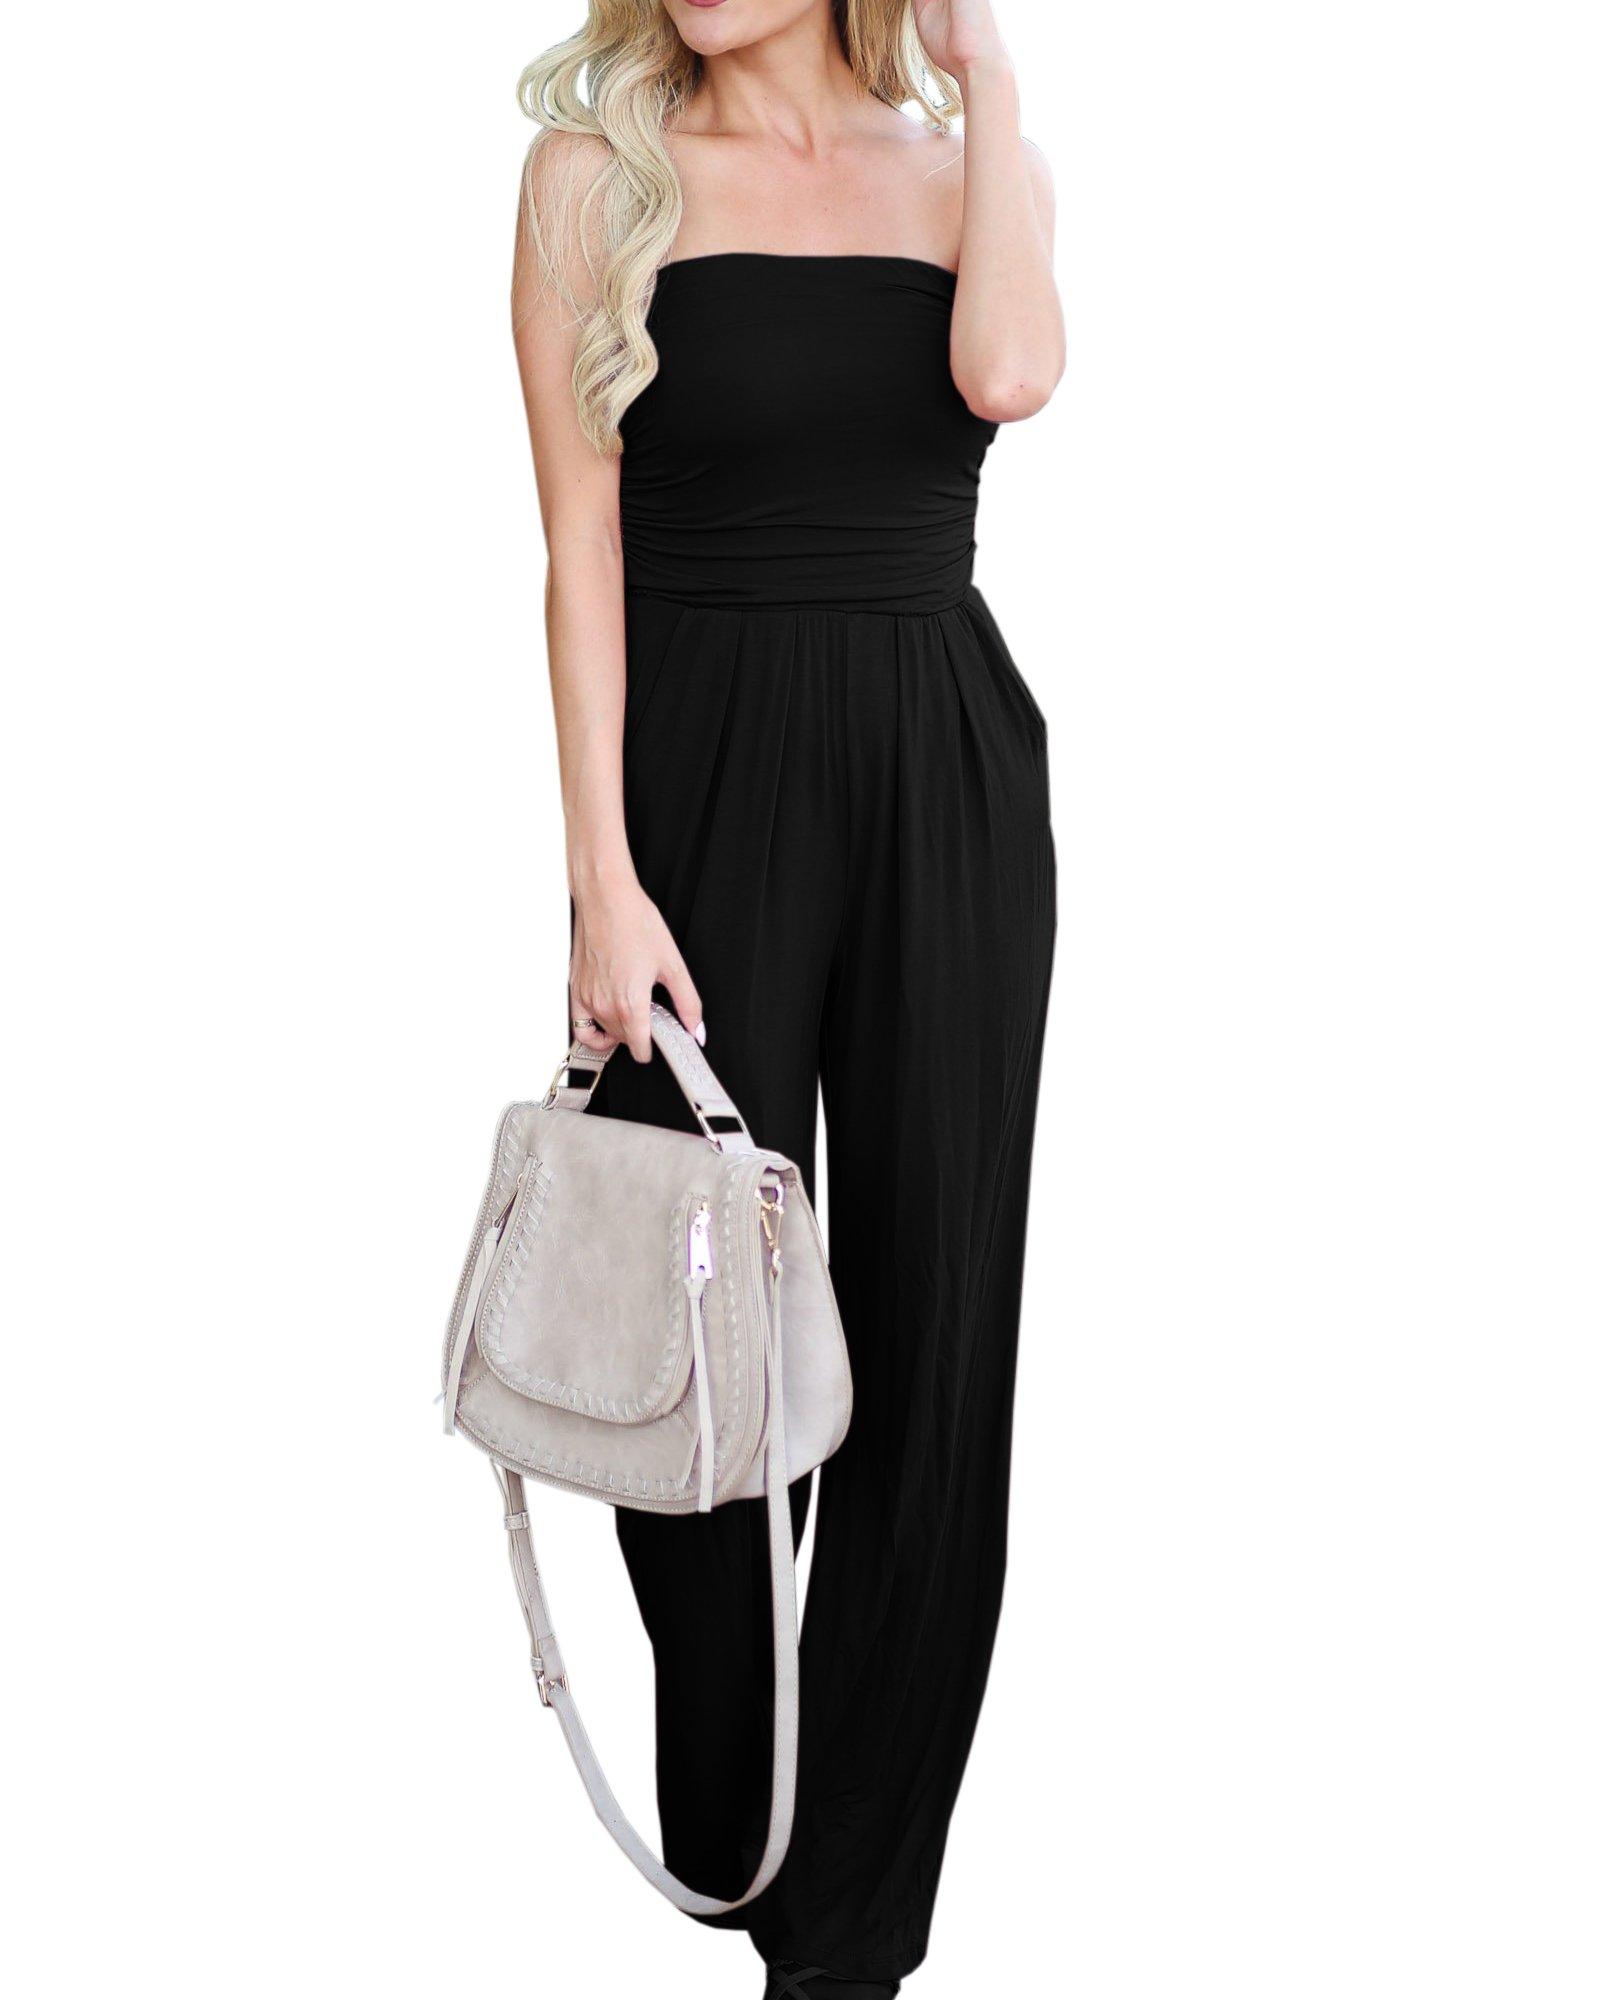 Ermonn Womens Off The Shoulder Jumpsuit Elegant Strapless Loose Wide Leg Jumpsuit Rompers